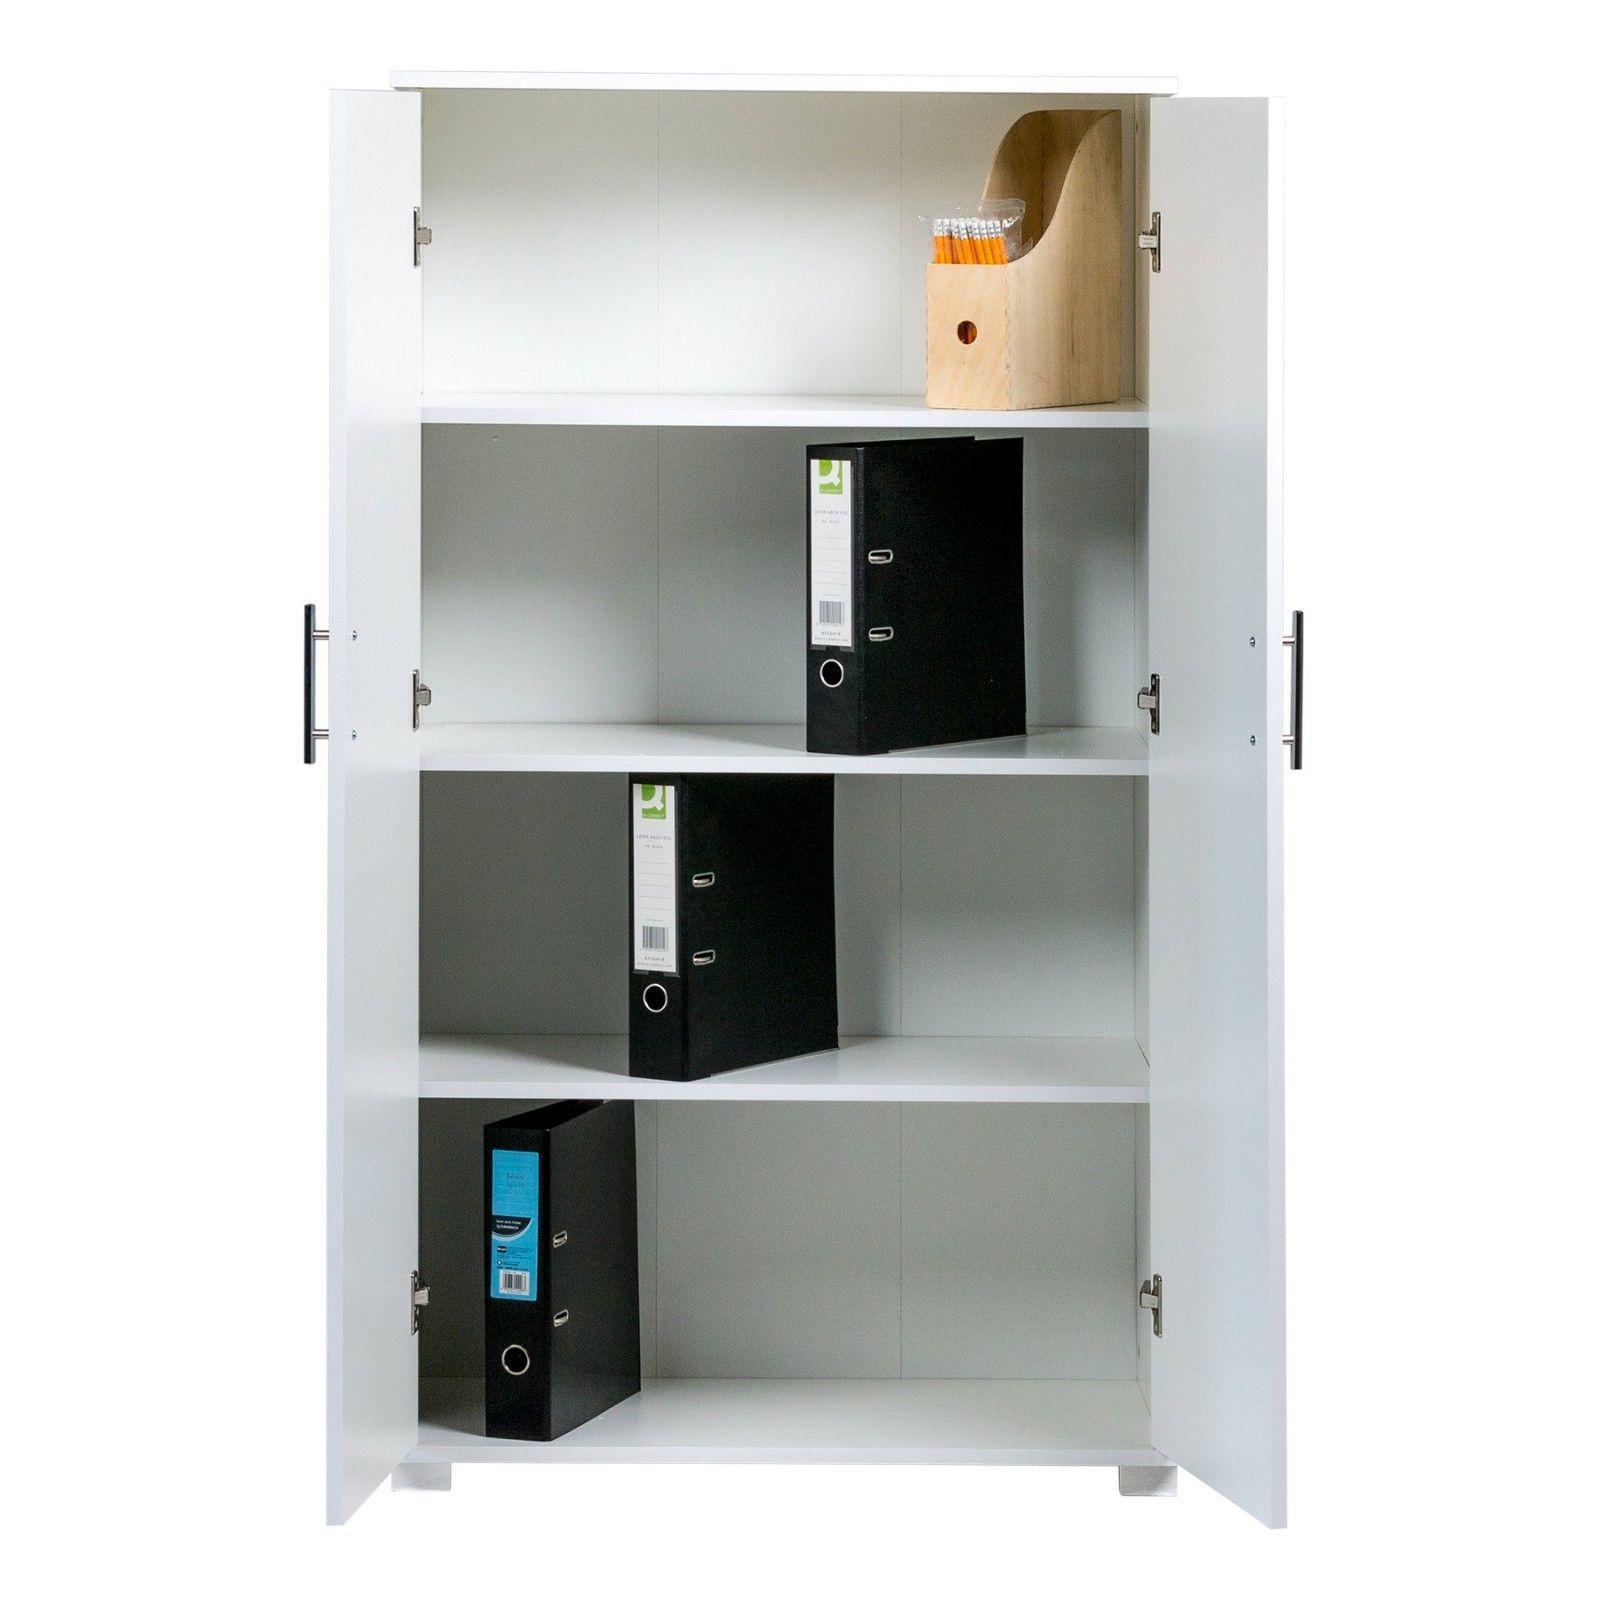 Tall 2 Door Pantry Utility Cabinet Storage Cupboard Wood Black Kitchen Office Sdrfurniture Contempora Black Kitchens Cupboard Storage Pantry Storage Cabinet